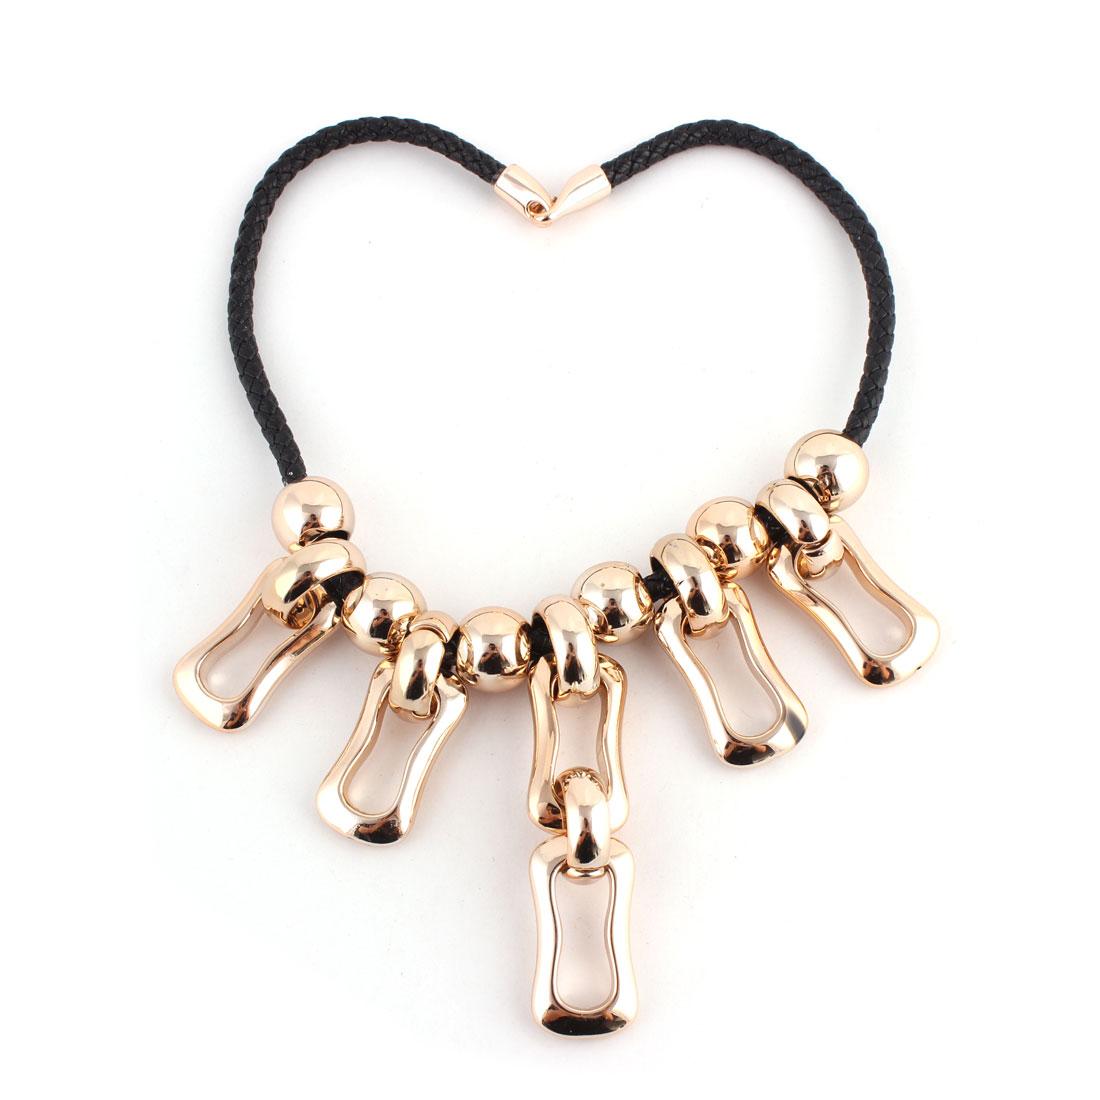 Faux Leather Cord Plastic Pendant Sweater Necklace Chain Party Decor Gold Tone Black